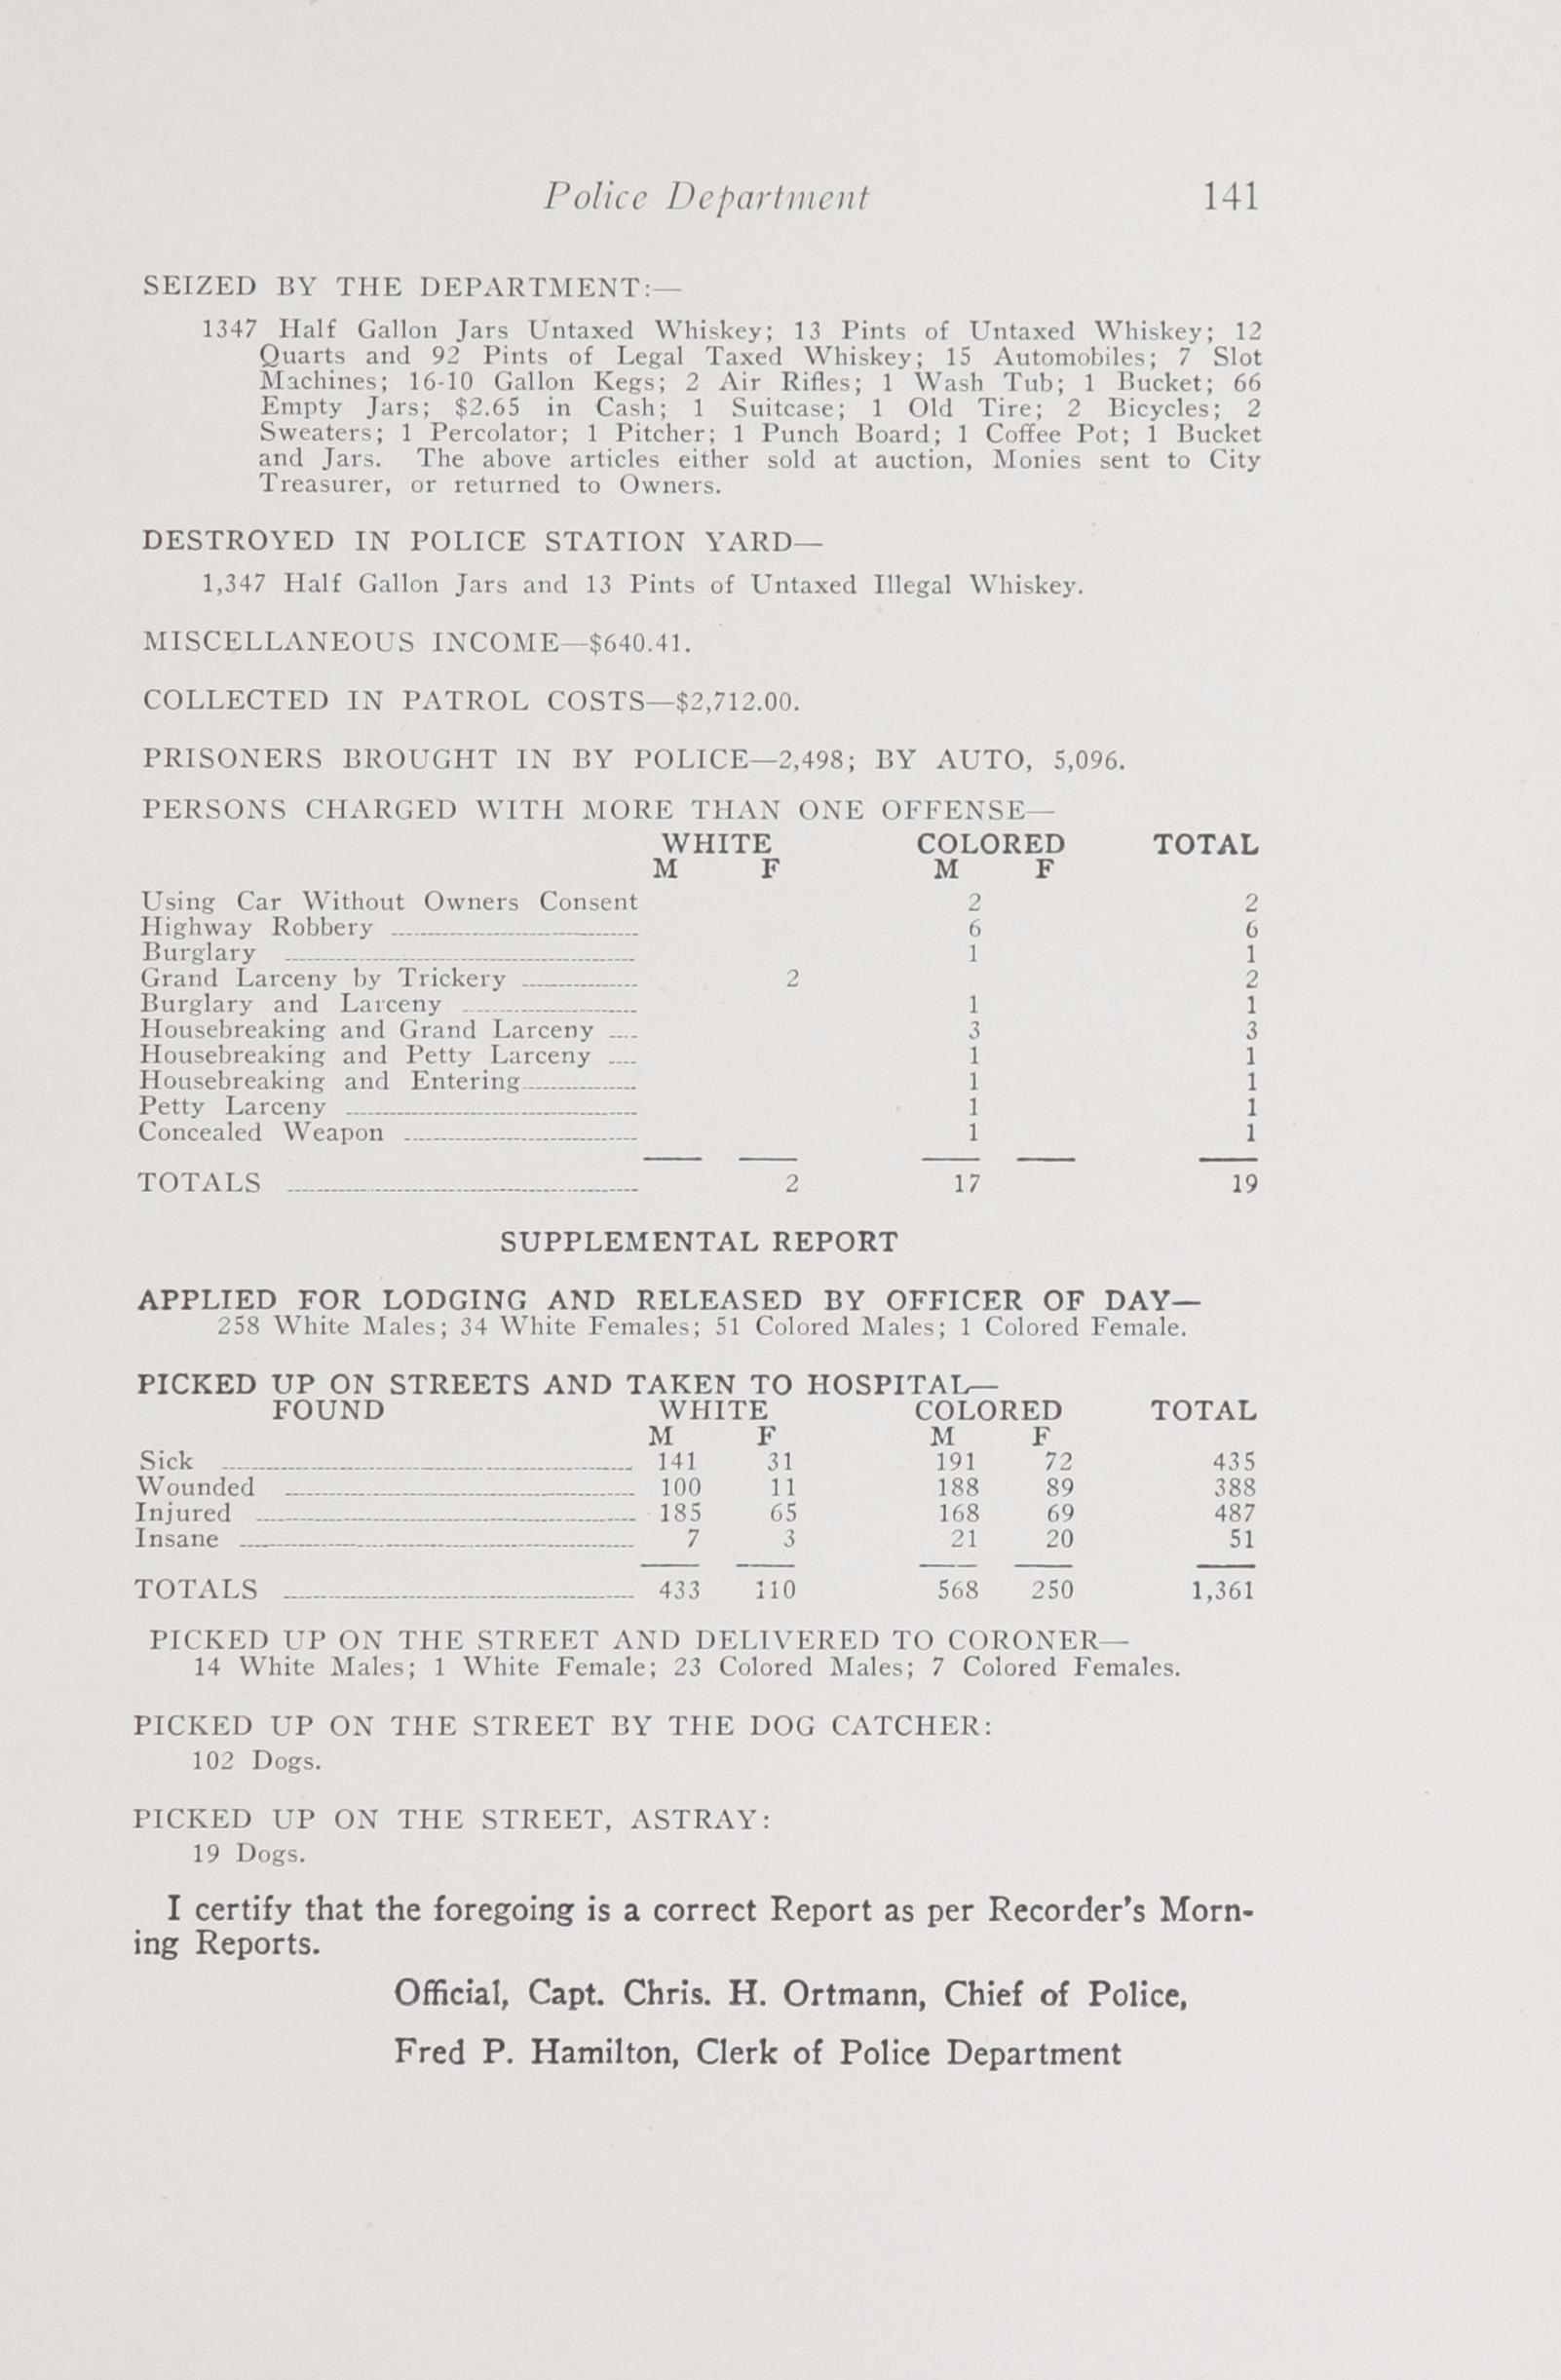 Charleston Yearbook, 1941, page 141